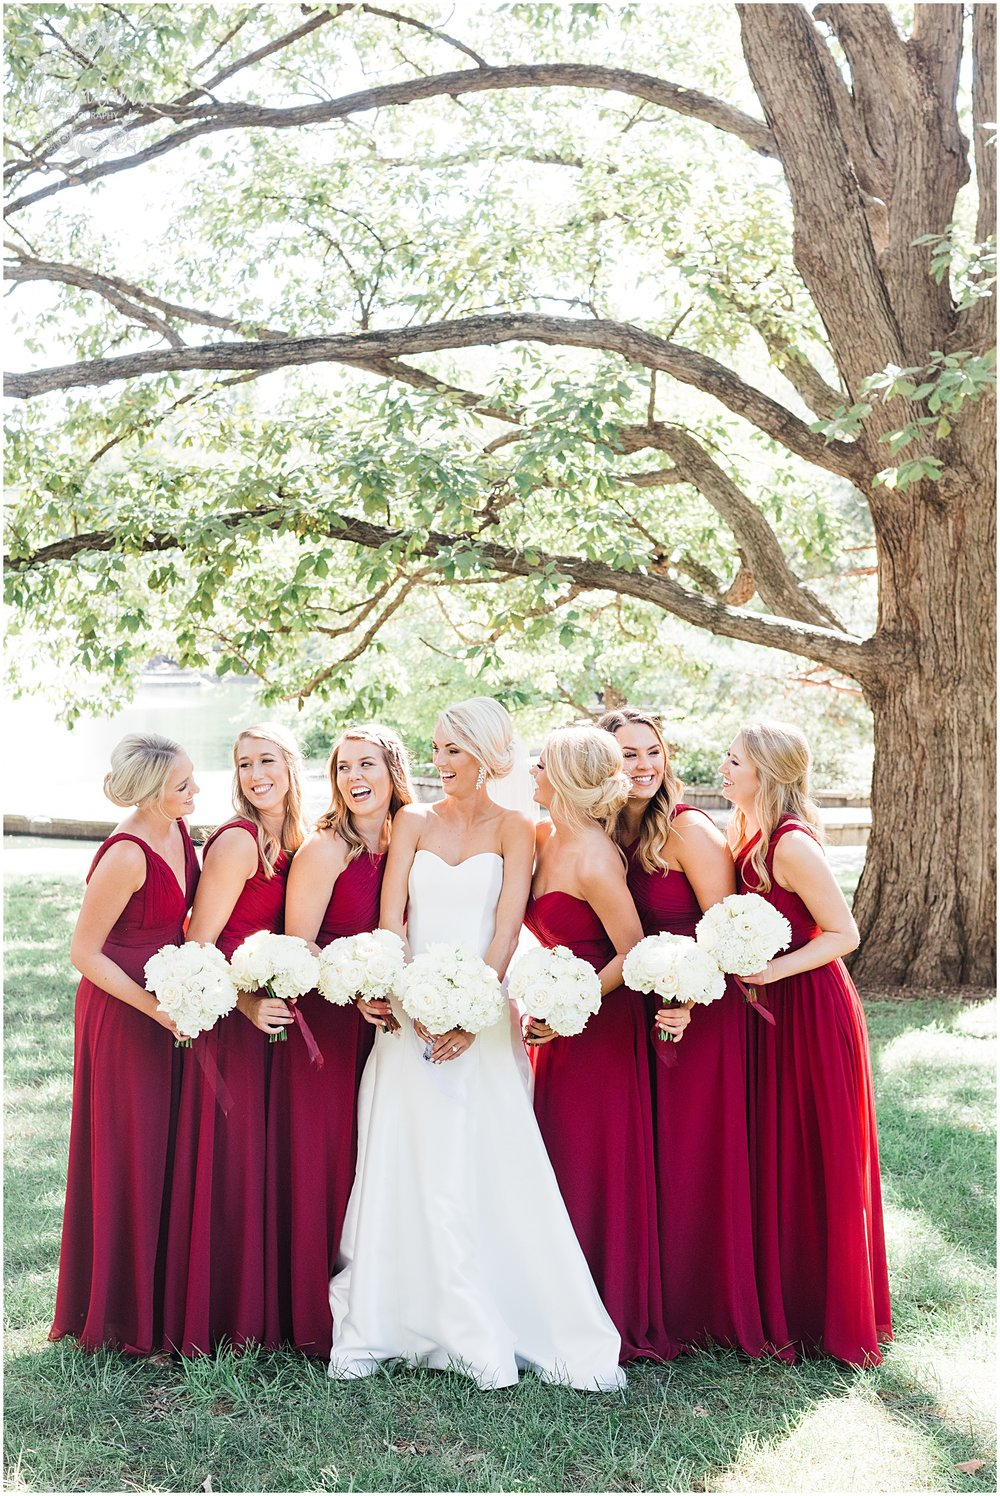 NOLL WEDDING | THE BRASS ON BALTIMORE | MARISSA CRIBBS PHOTOGRAPHY_6300.jpg